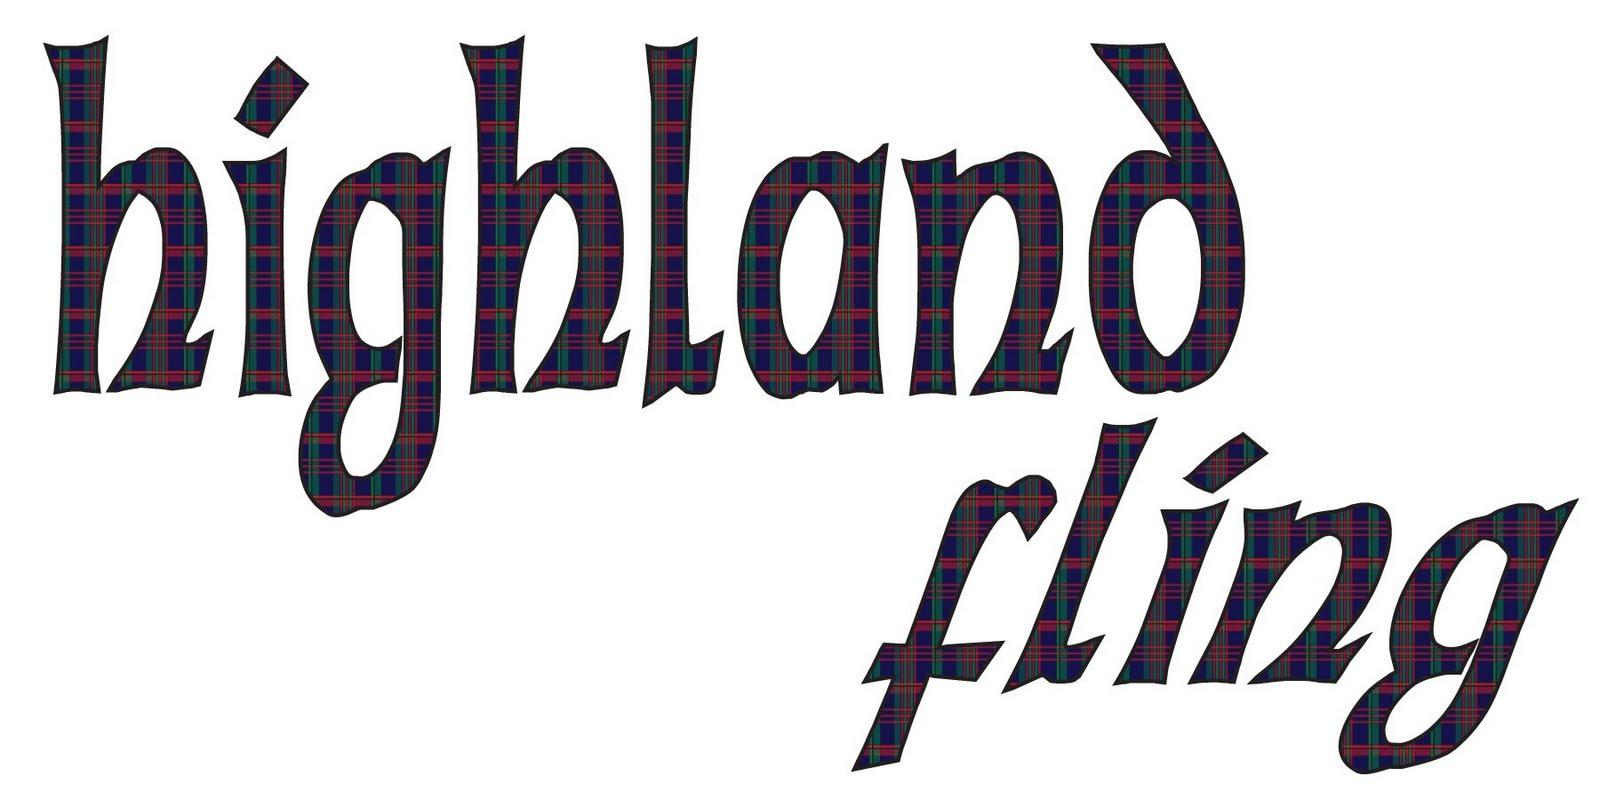 Highland Fling  My Grampian 26 Sailboat  June 2010